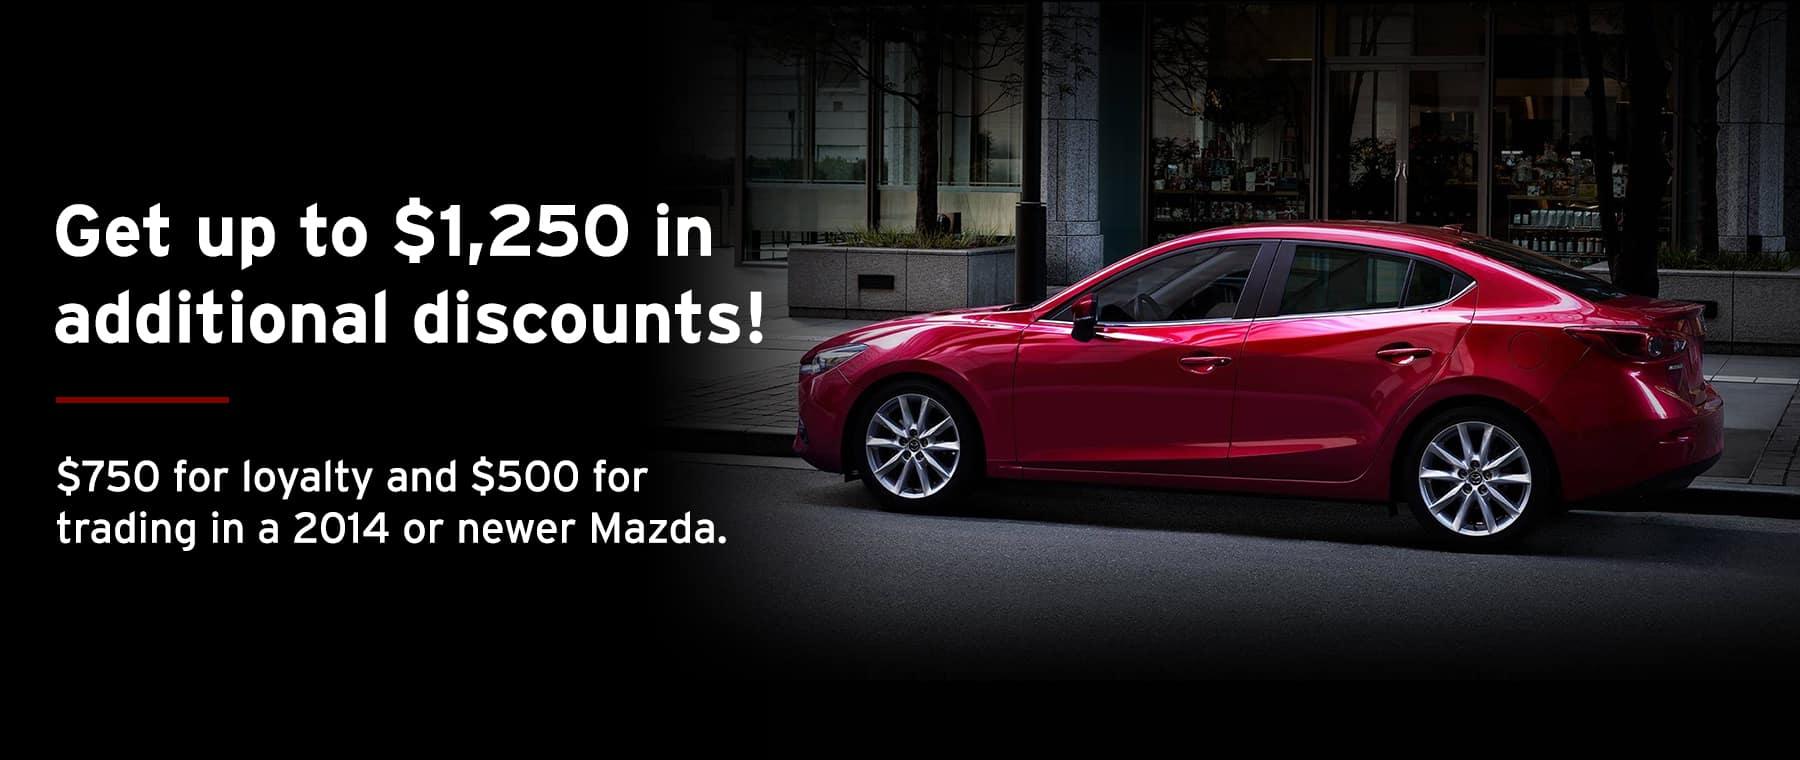 Power Mazda